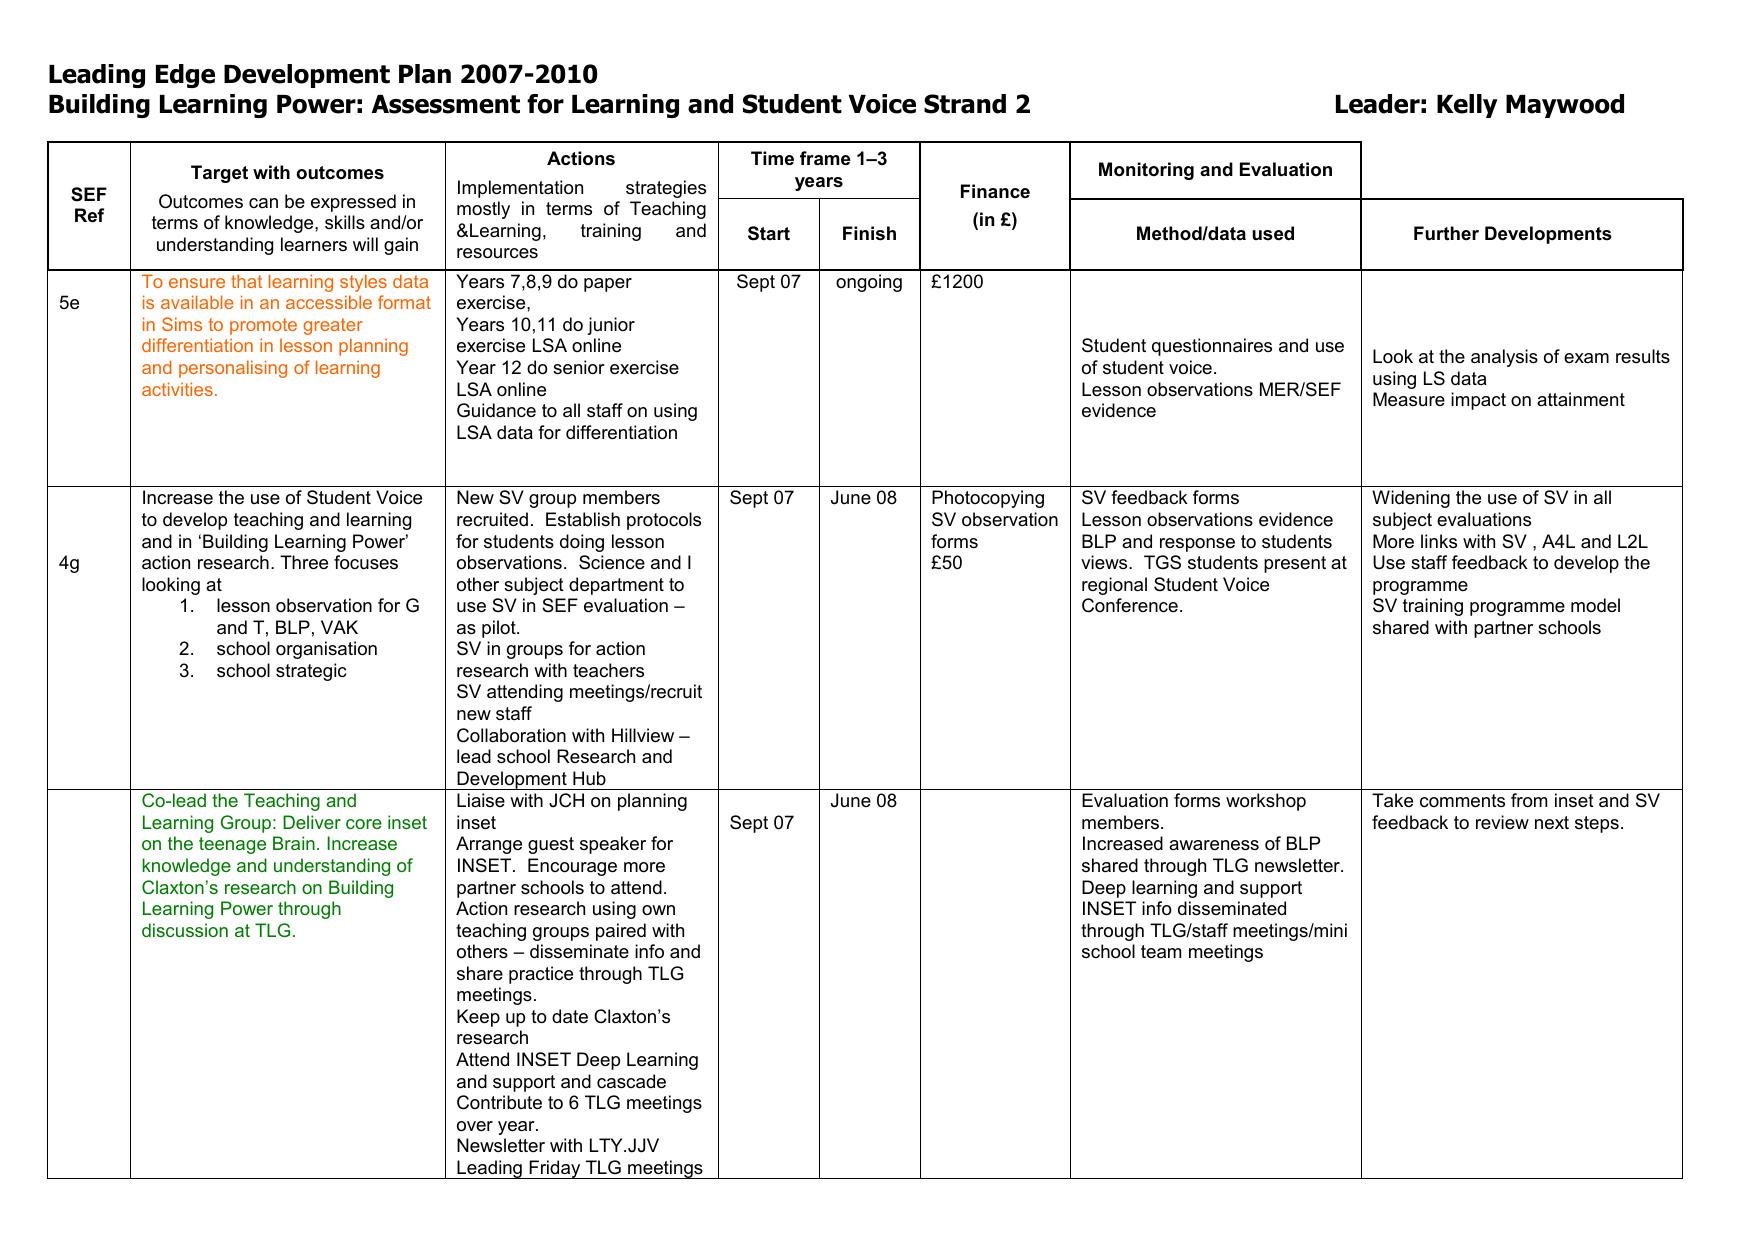 School Development Plan Template 2007-2010